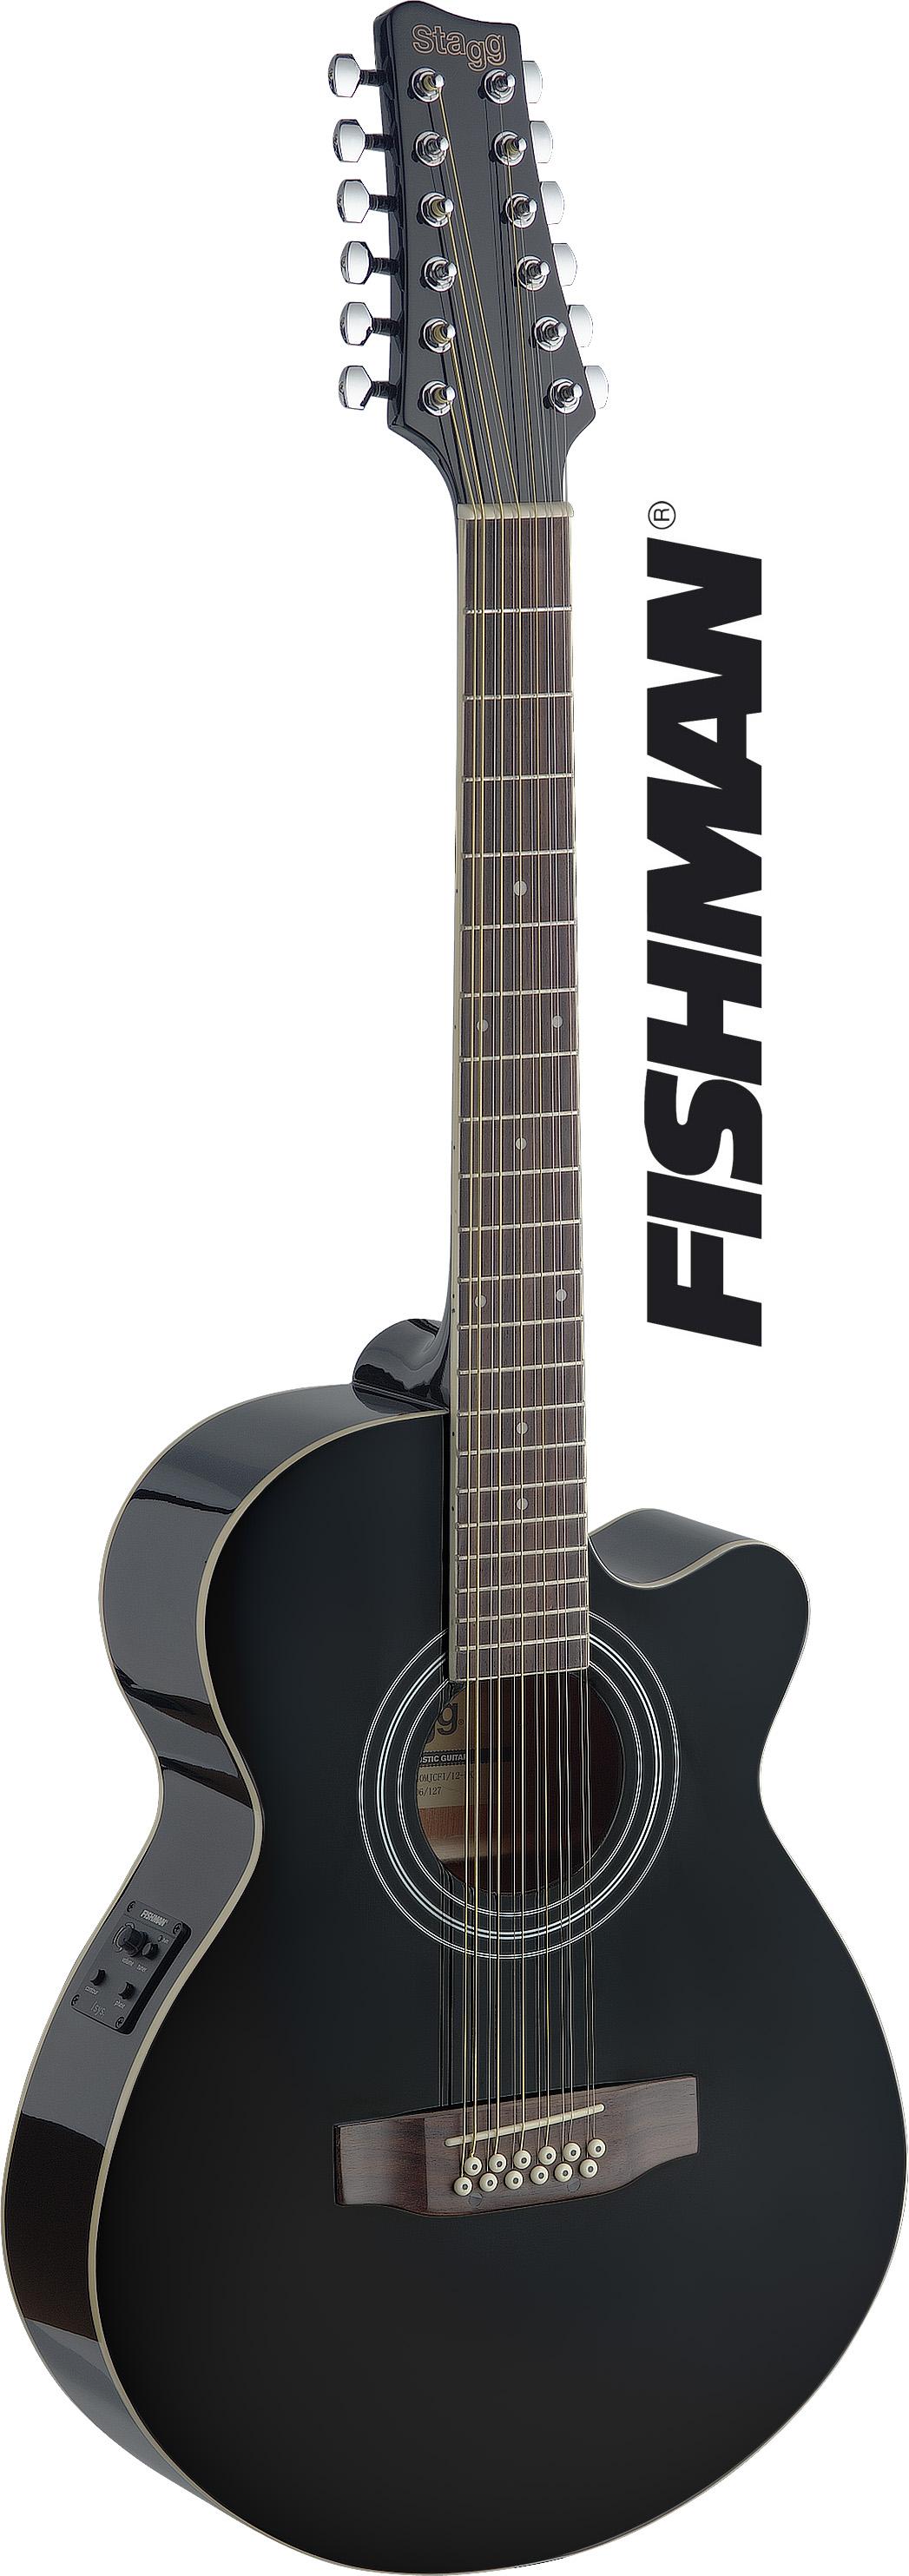 Stagg SA40MJCFI/12-BK, elektroakustická kytara typu Mini Jumbo, dvanáctistrunná